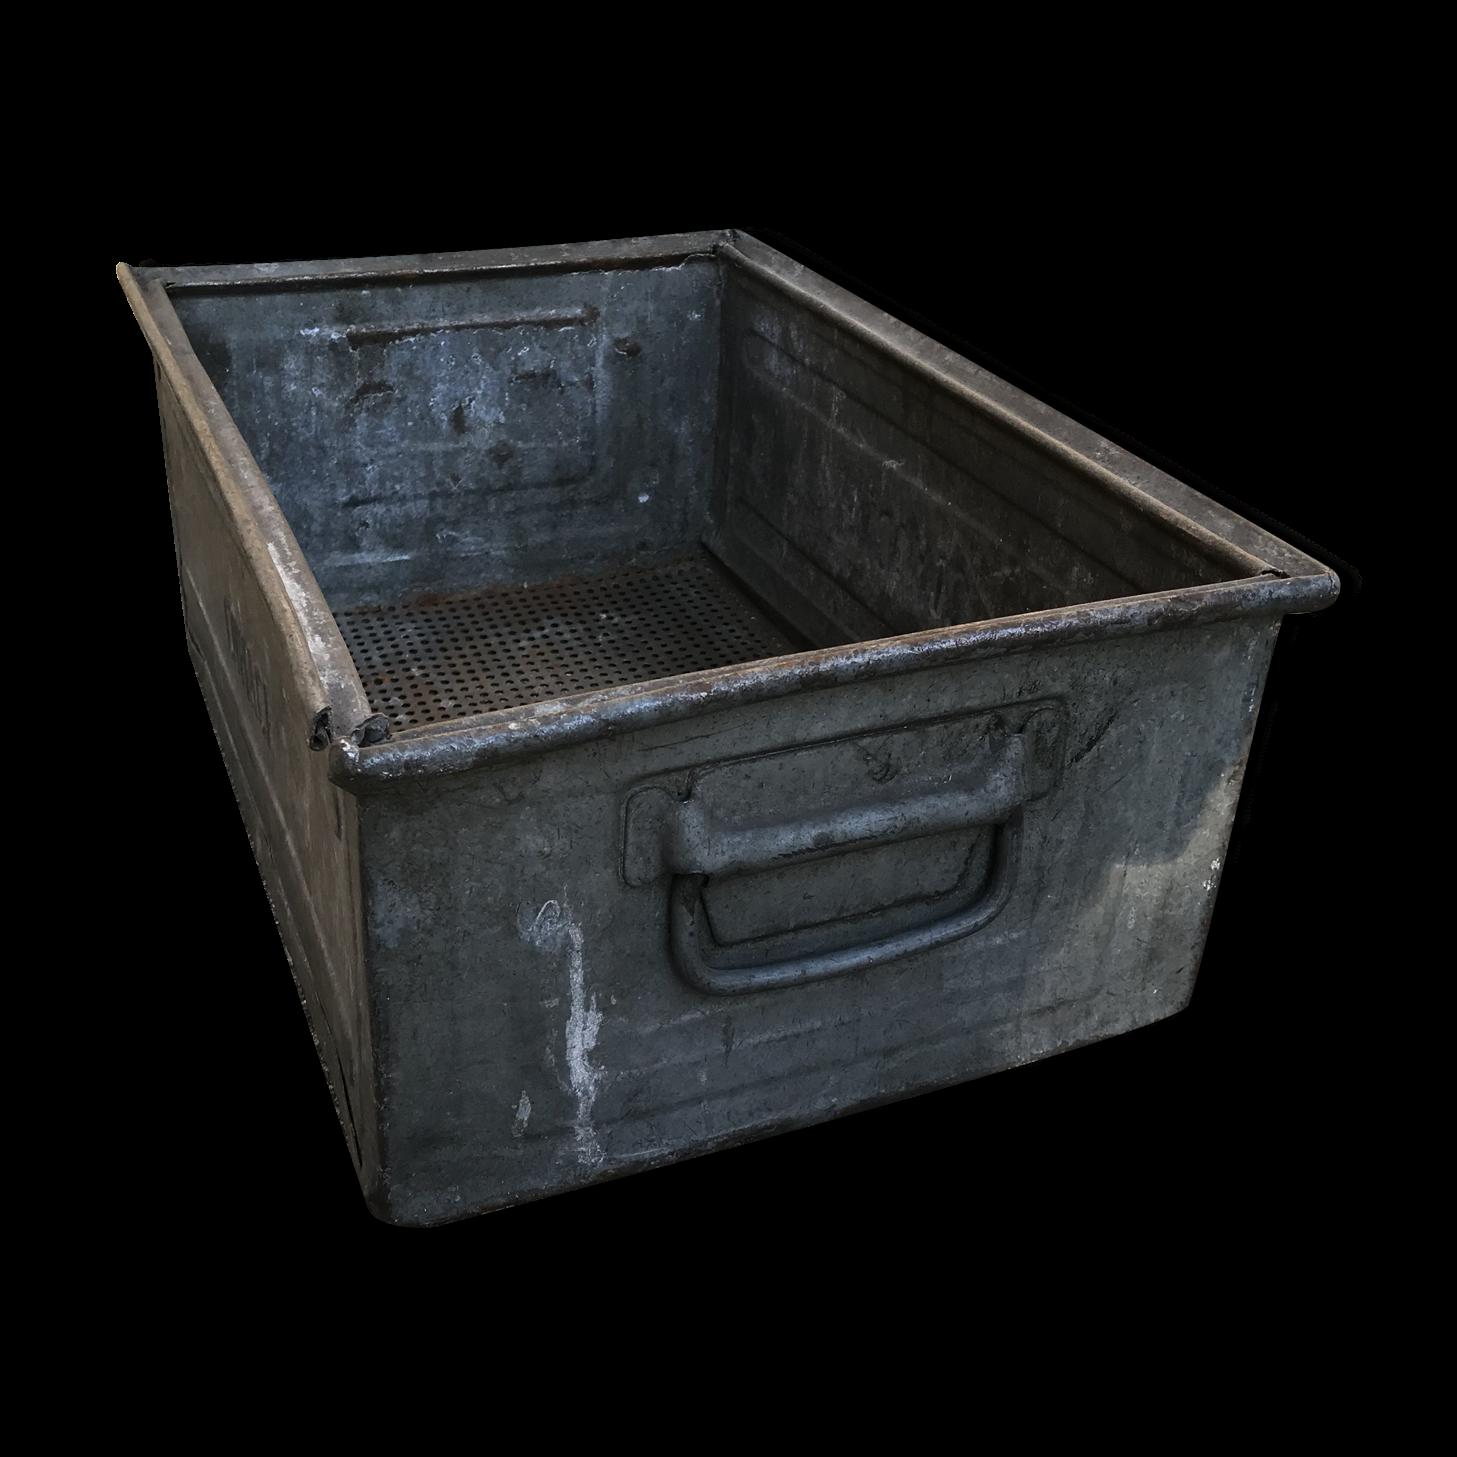 casier industriel metal casier industriel en metal. Black Bedroom Furniture Sets. Home Design Ideas